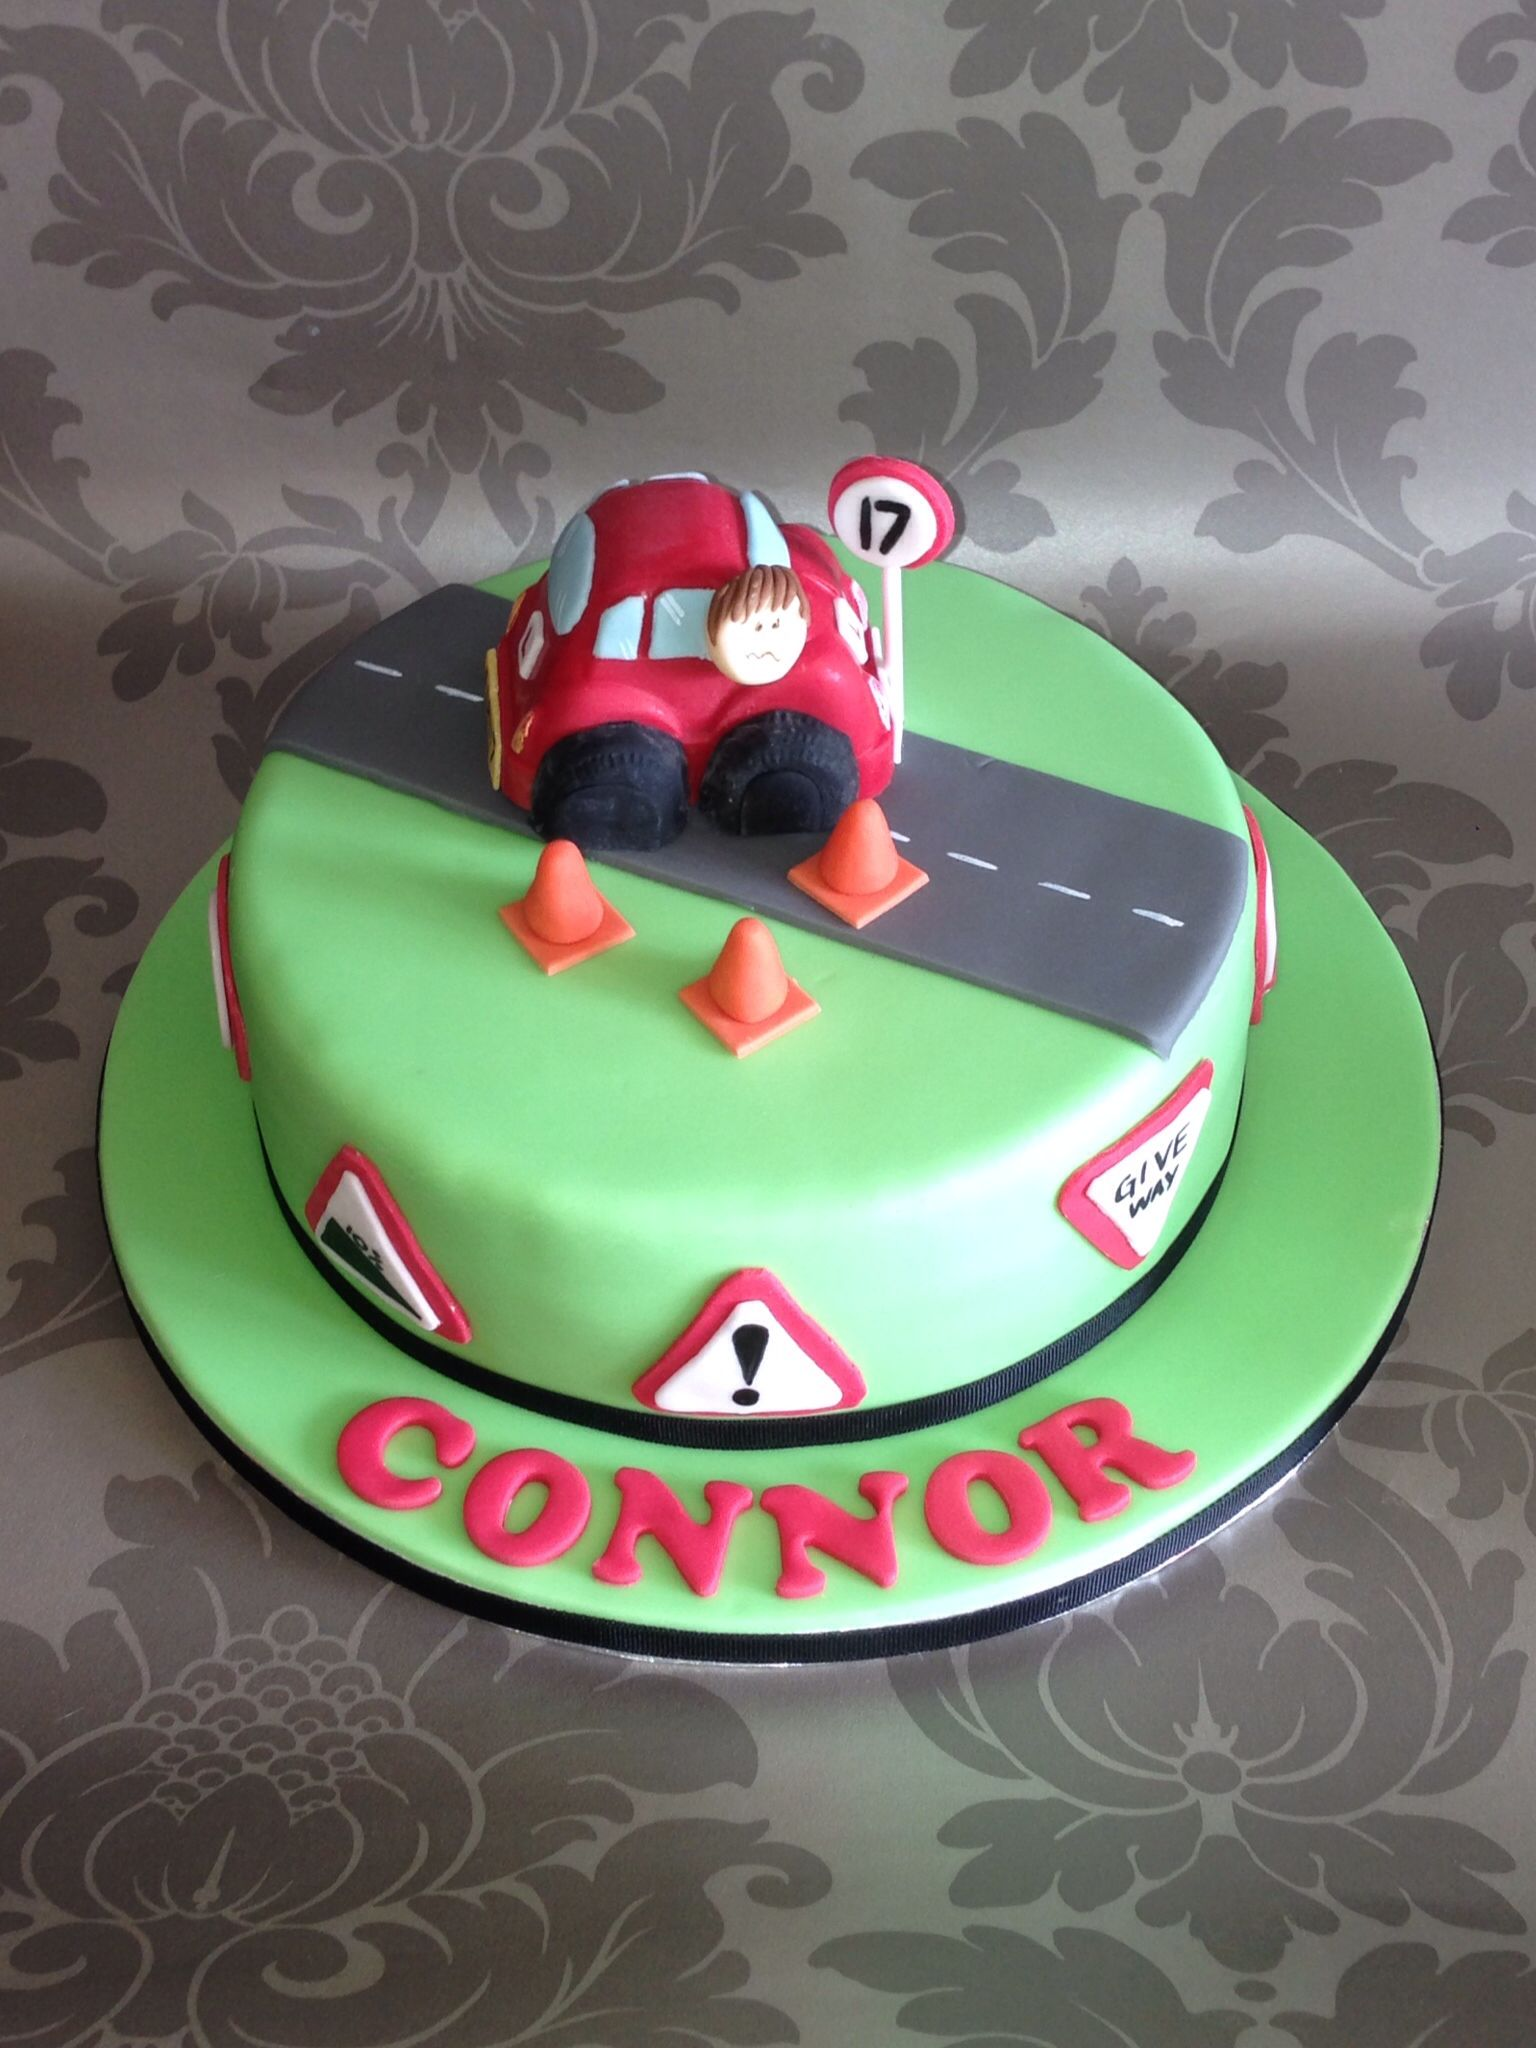 New Driver Cake